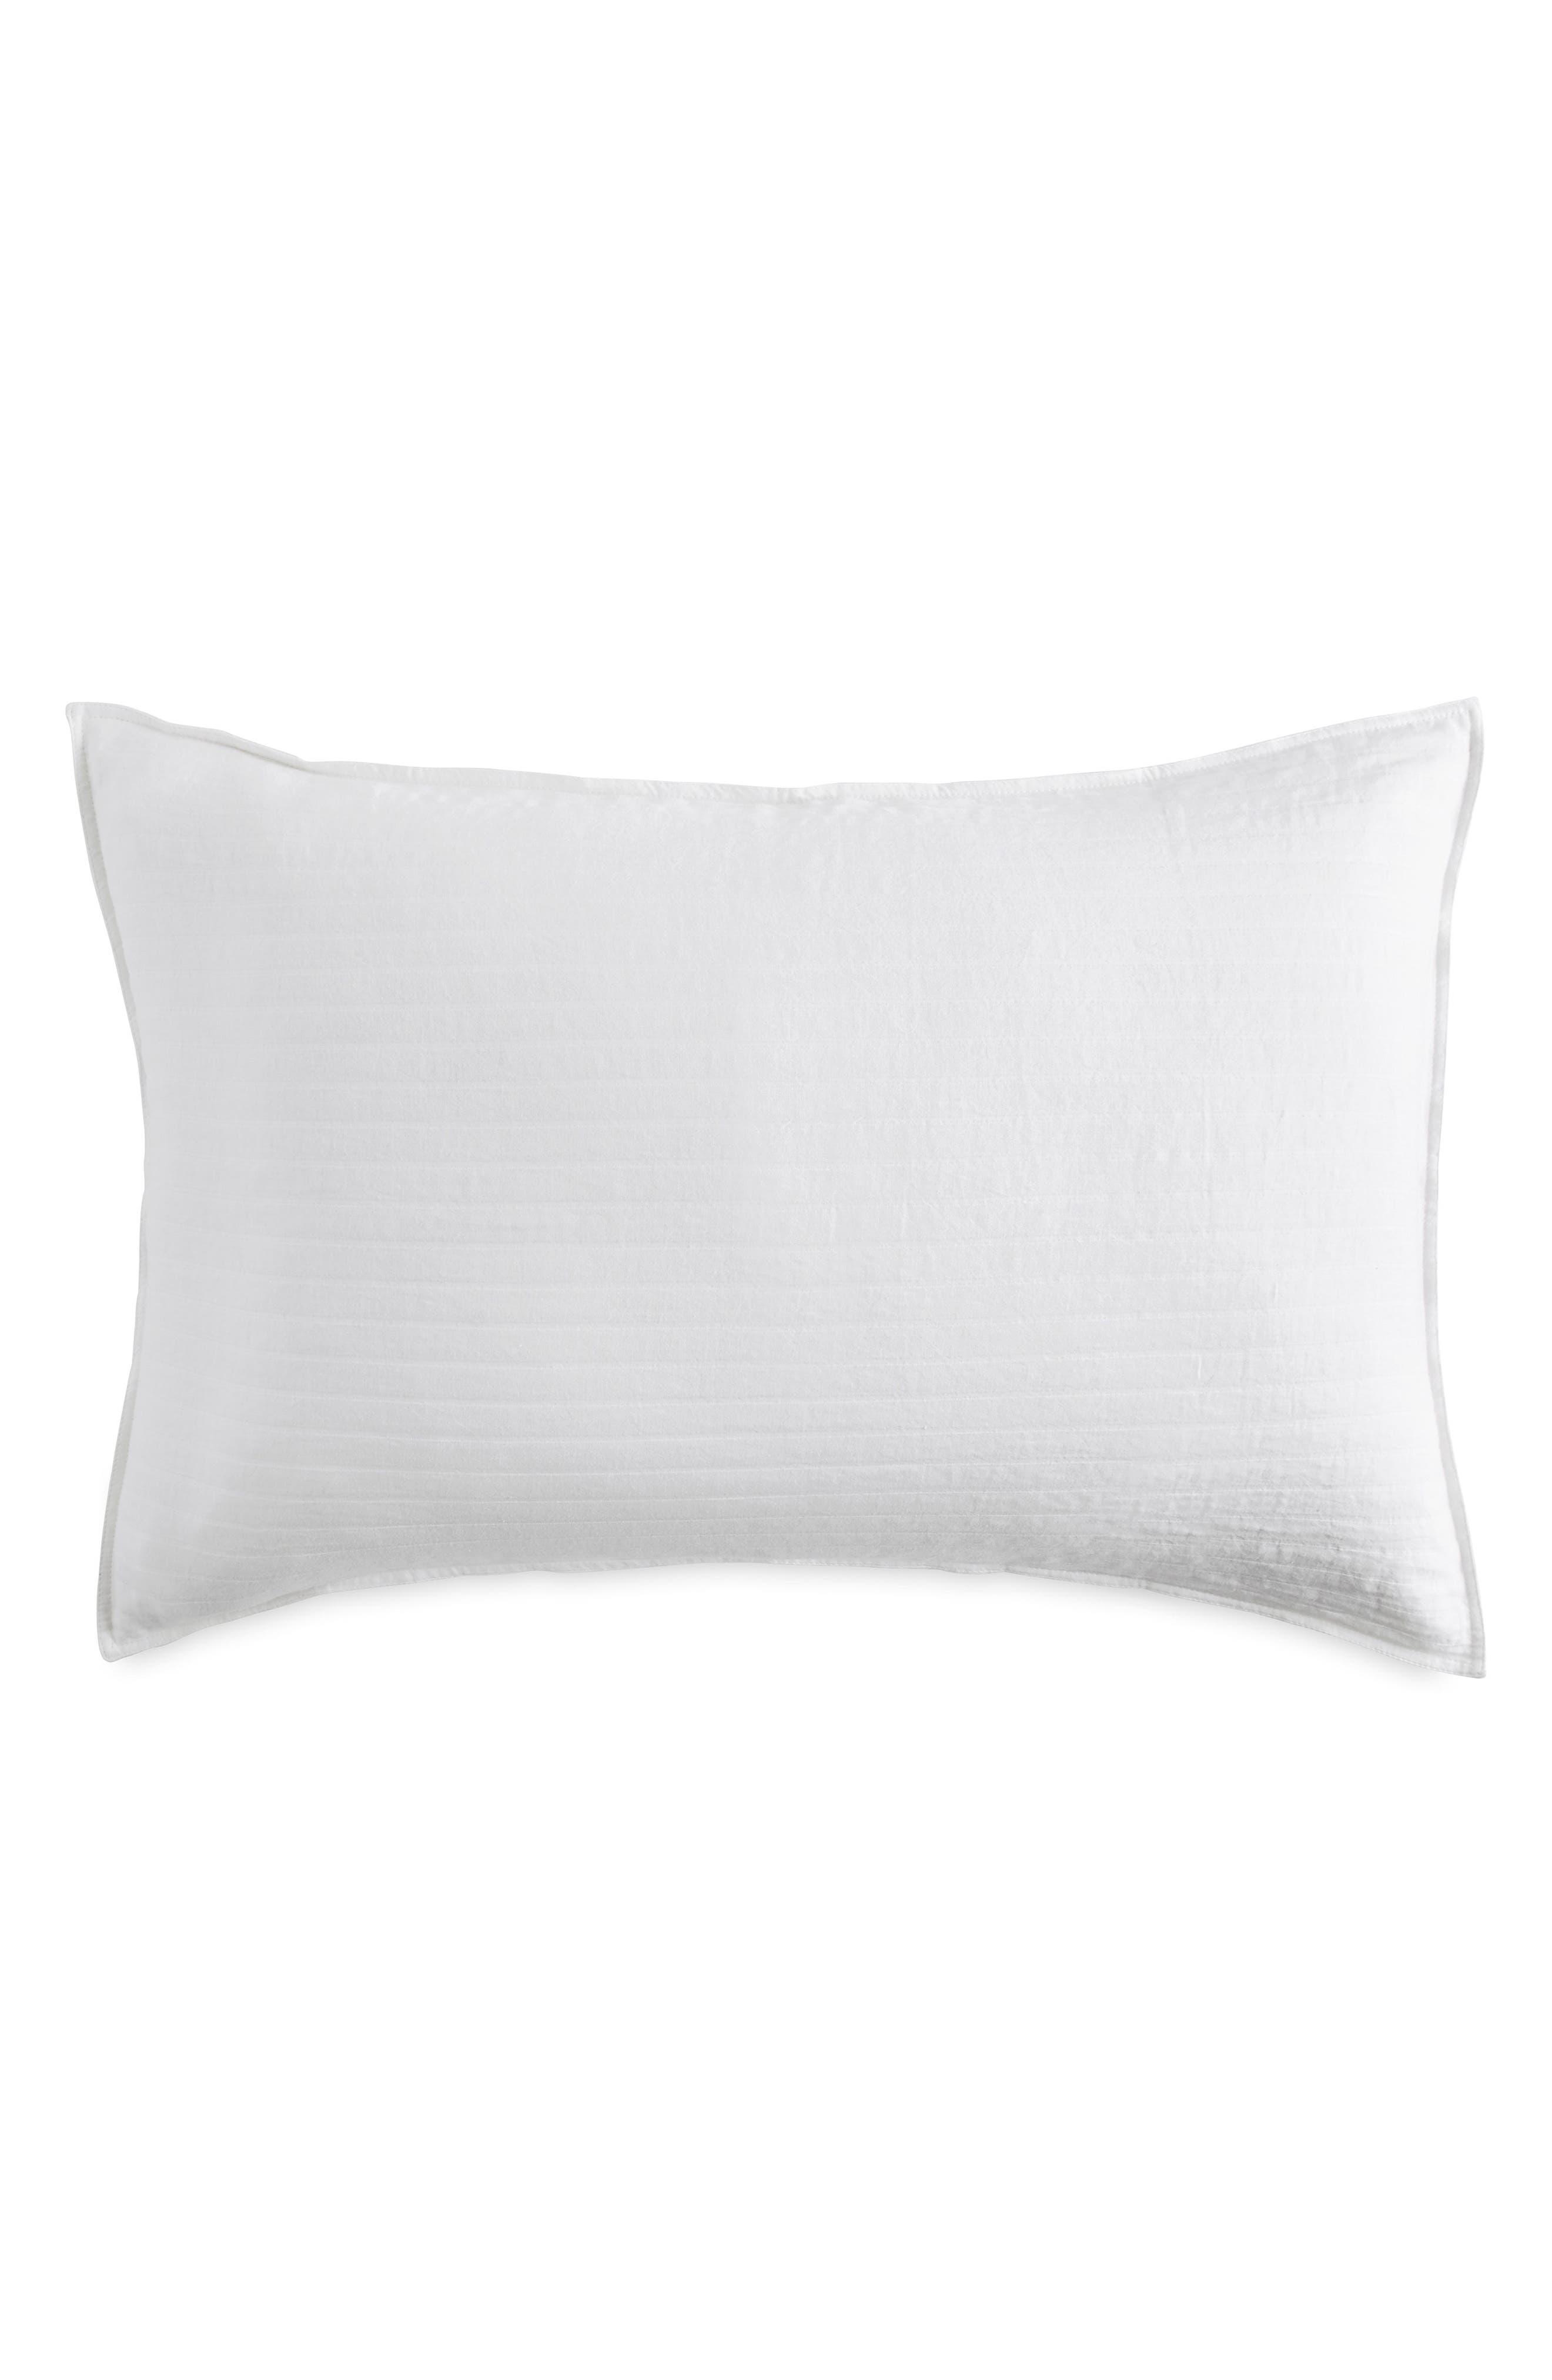 DKNY PURE Comfy White Pillow Sham, Main, color, WHITE